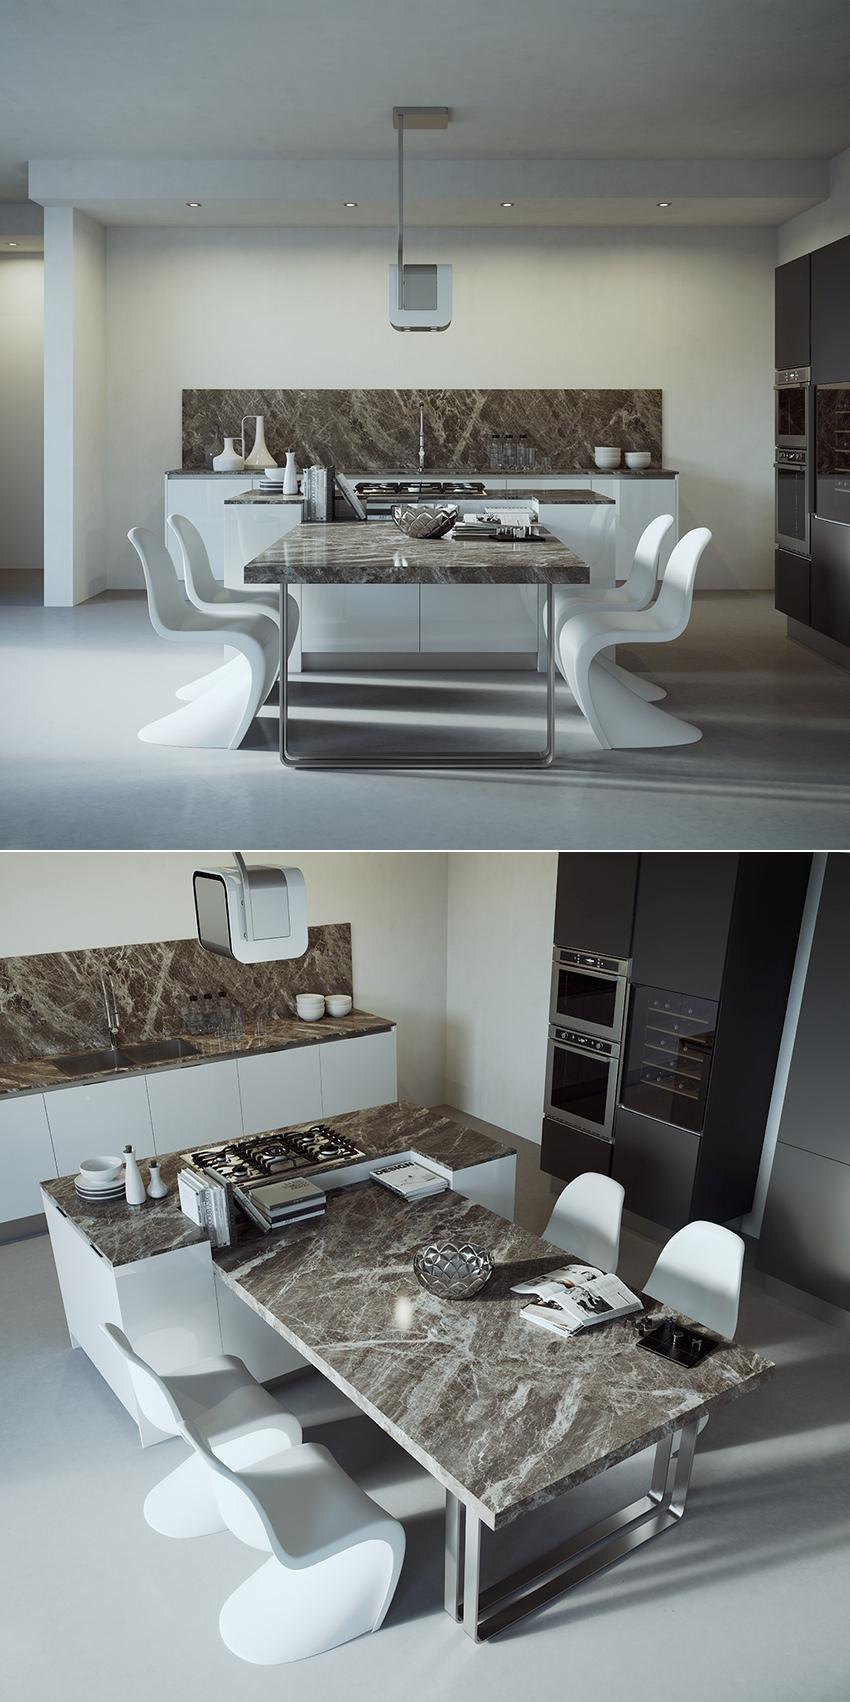 6-modern-kitchen-table